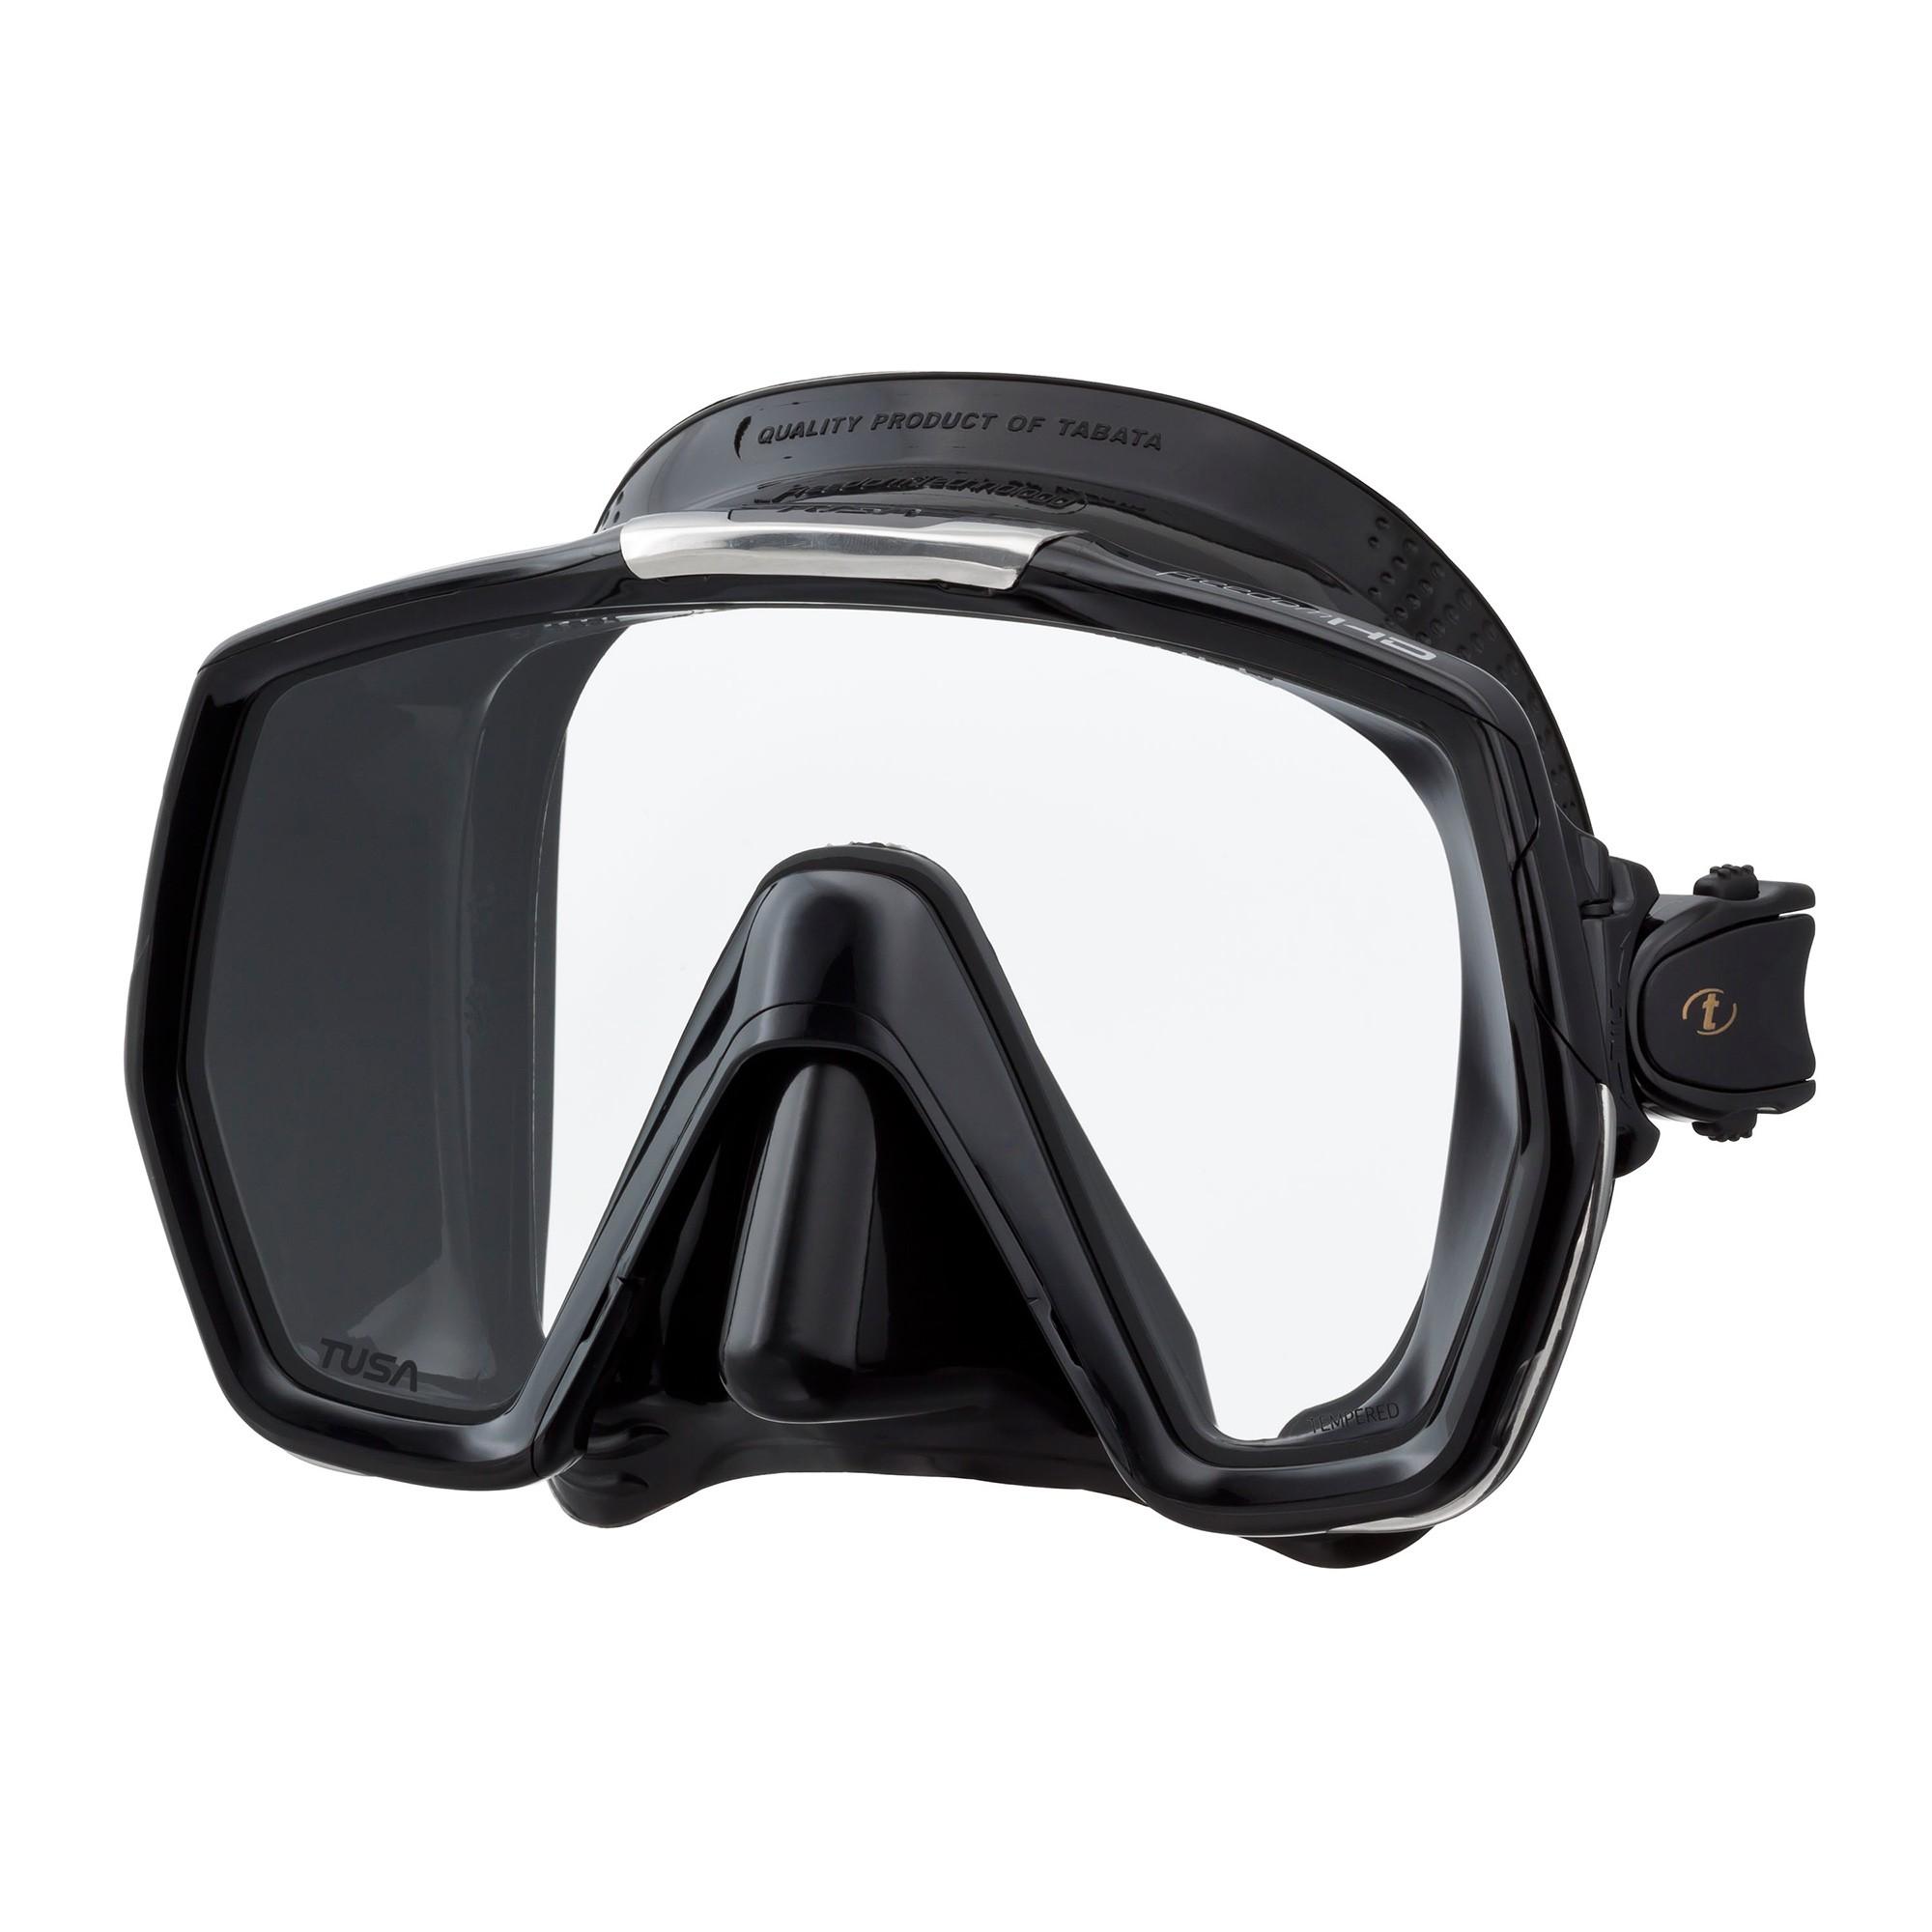 TUSA Freedom HD Mask blk blk